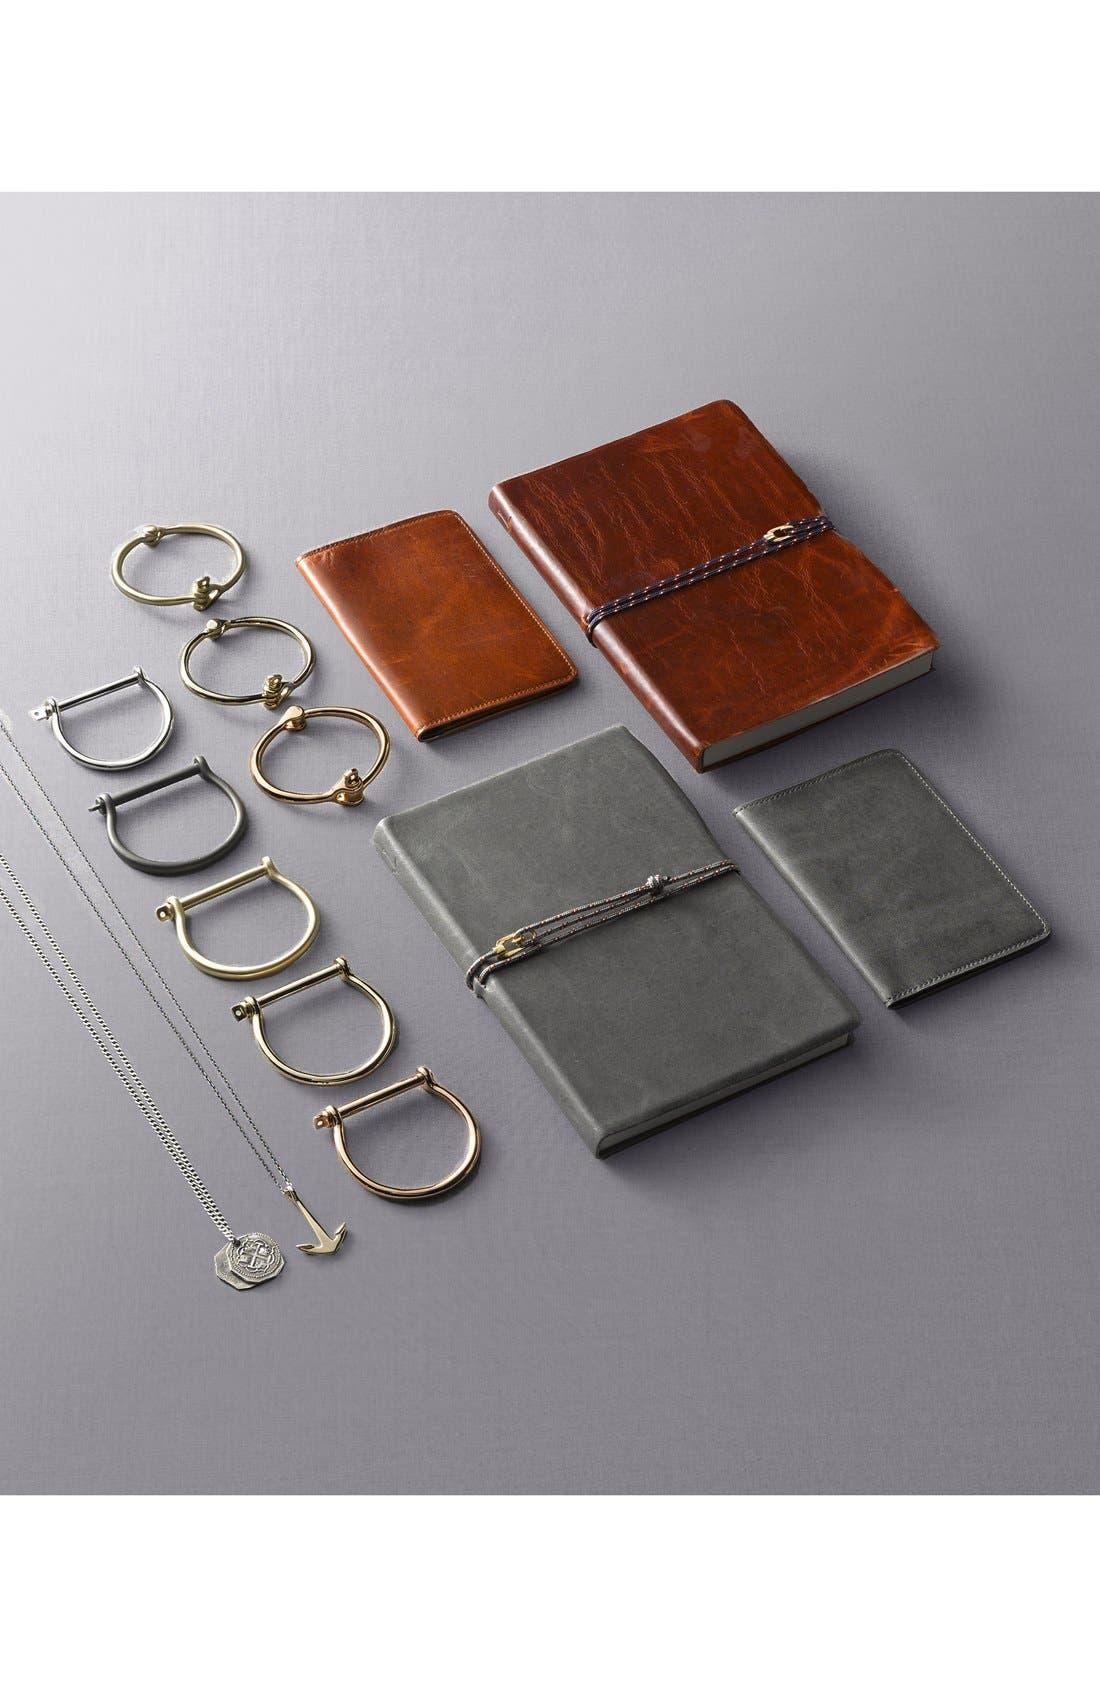 MIANSAI 'Noir' Screw Cuff Bracelet, Main, color, 681